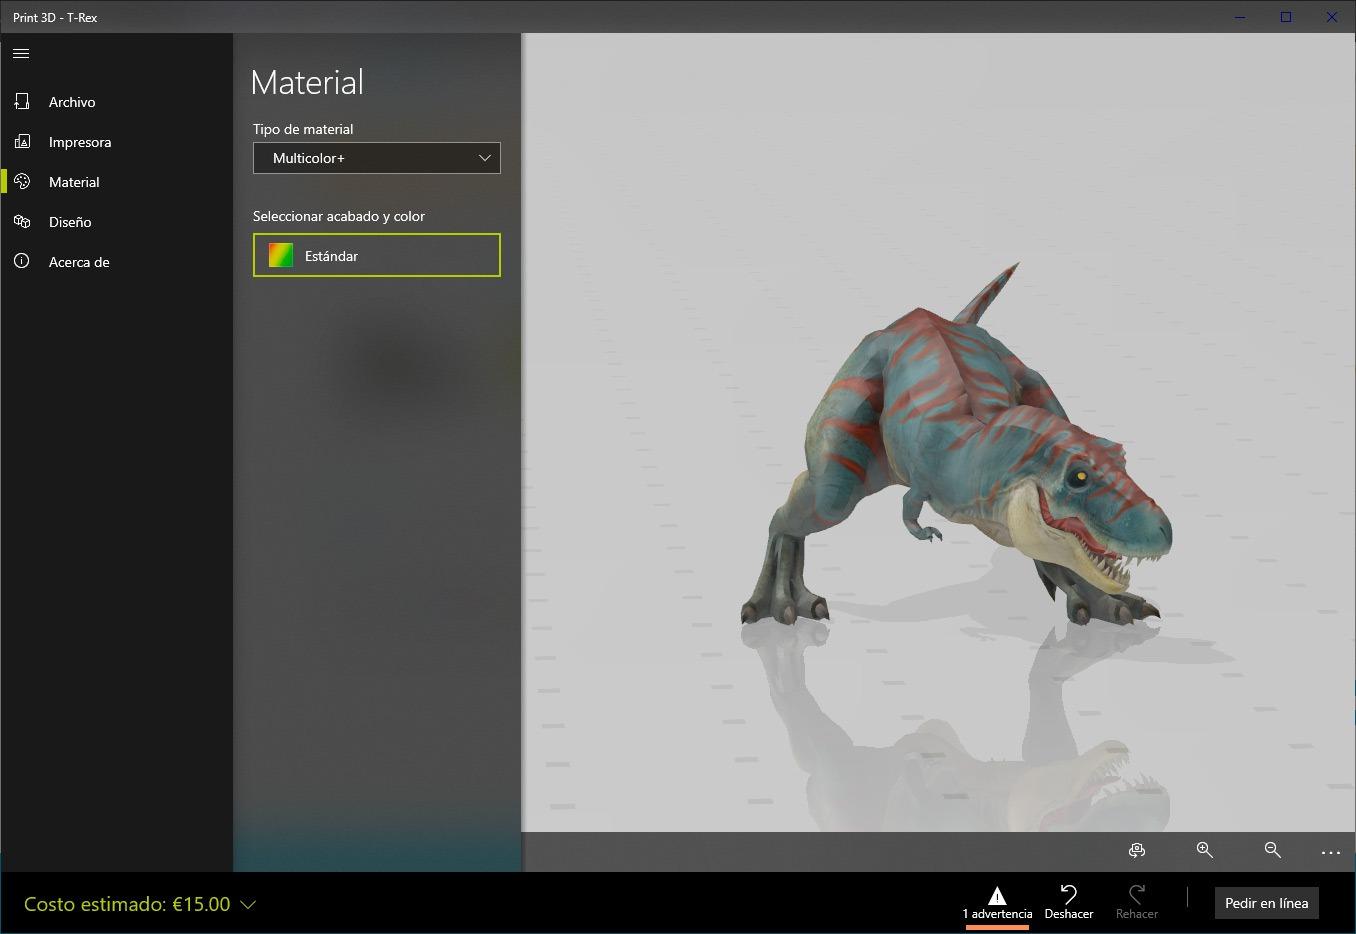 Print 3D en Windows 10